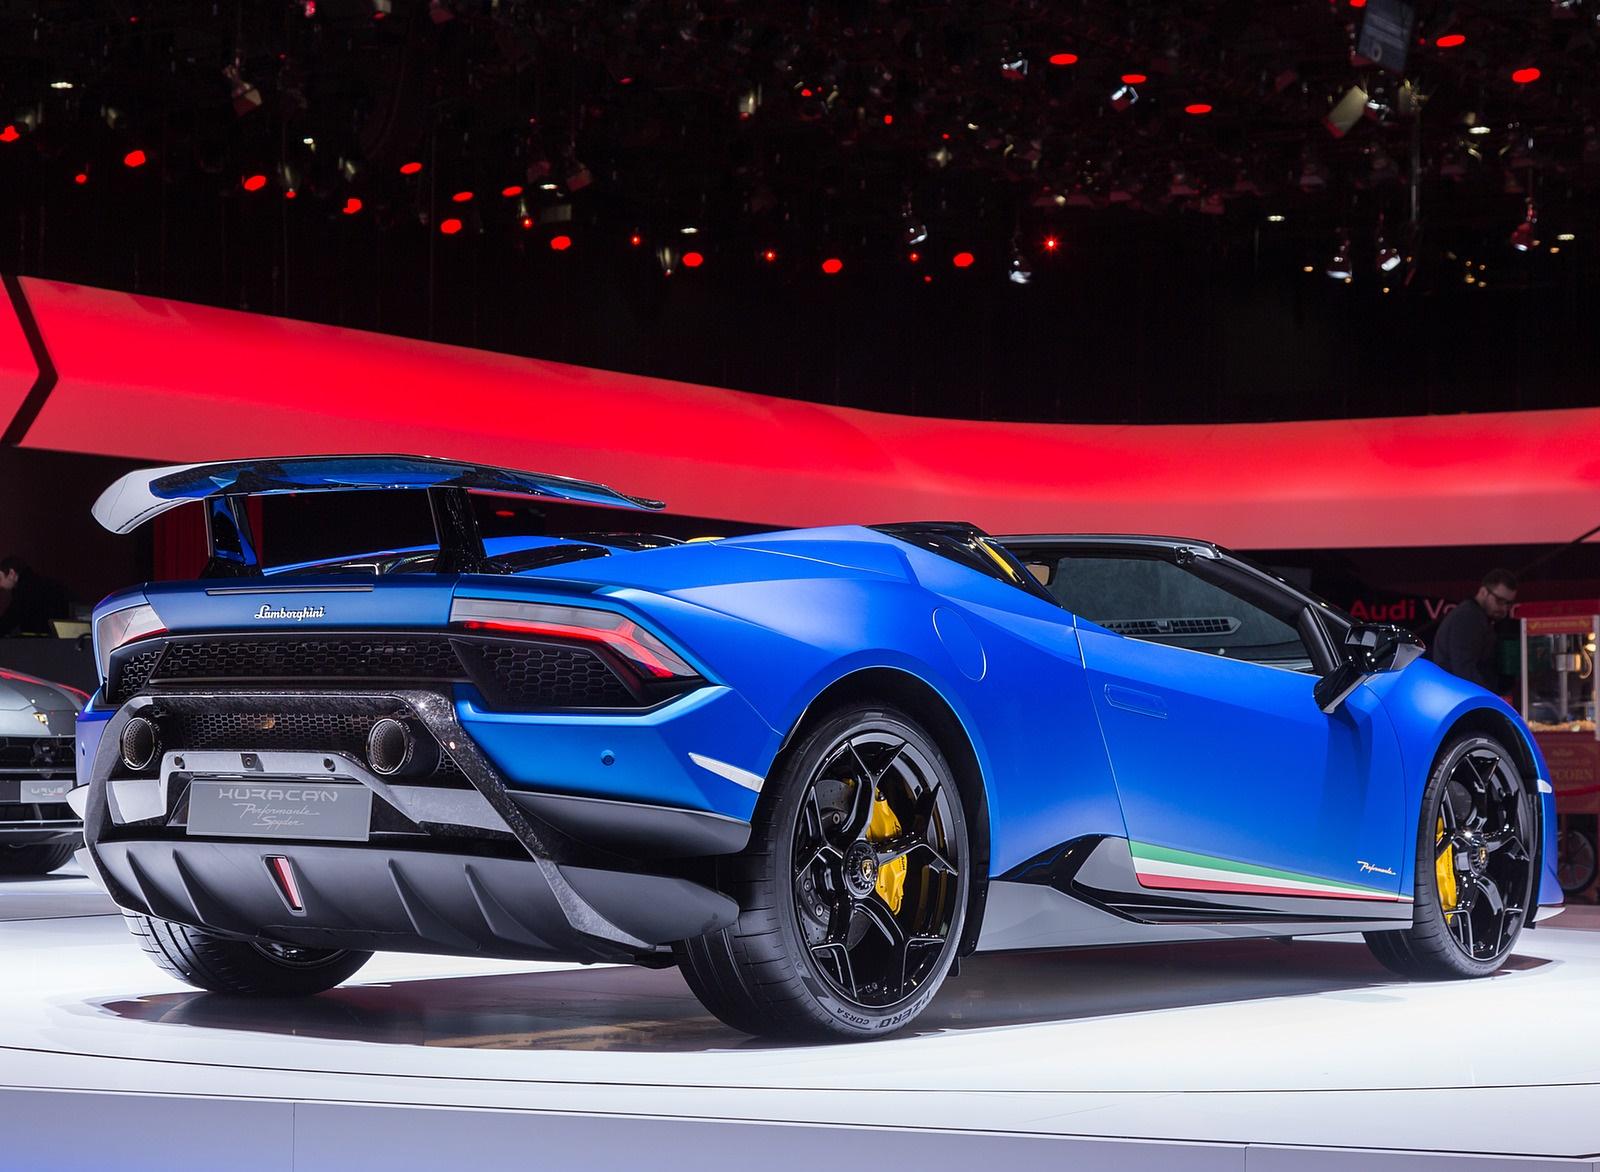 2019 Lamborghini Huracan Performante Spyder Rear Three Quarter